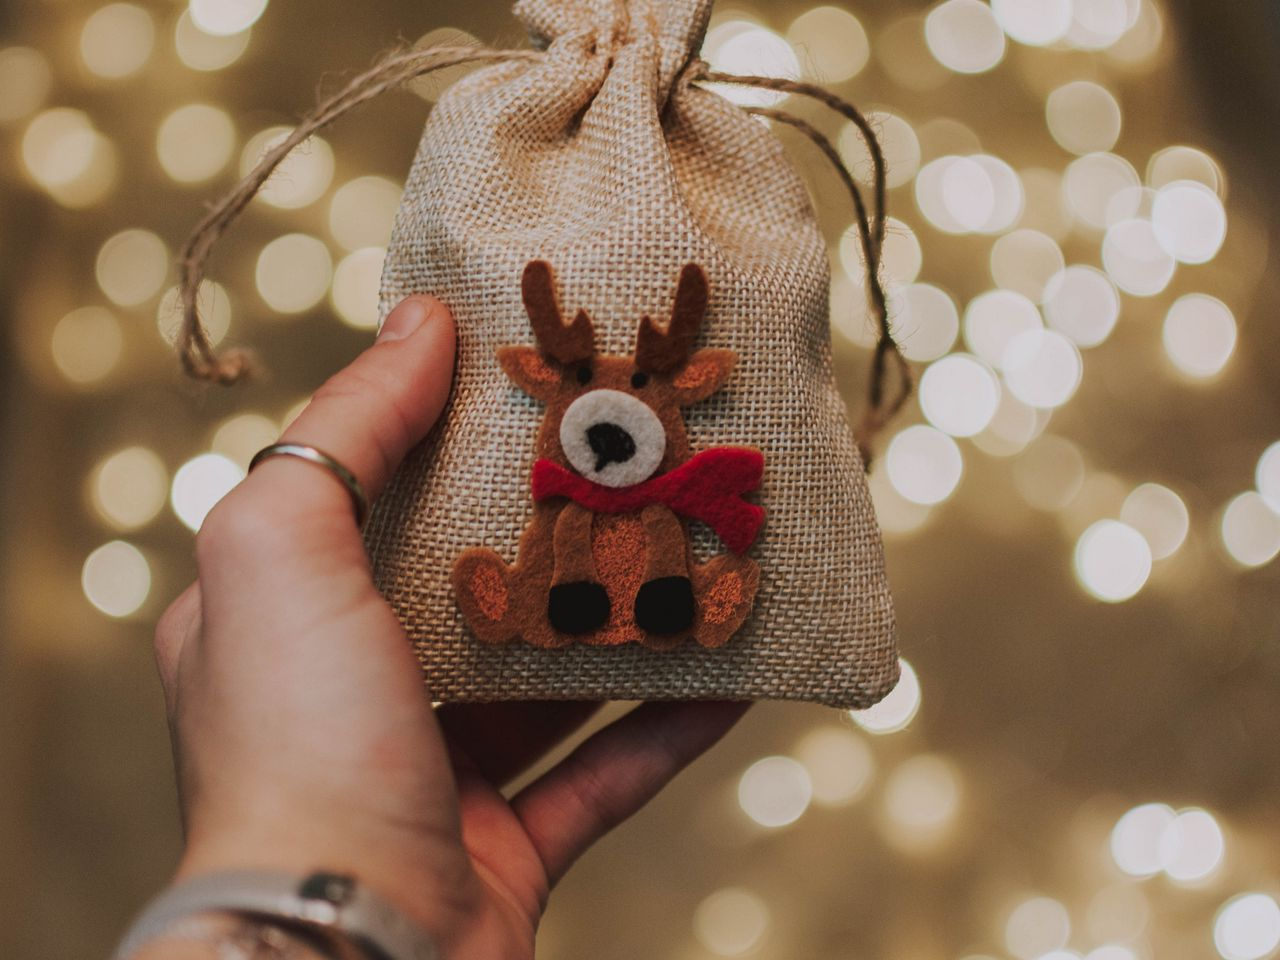 1280x960 Wallpaper gift, new year, christmas, deer, hand